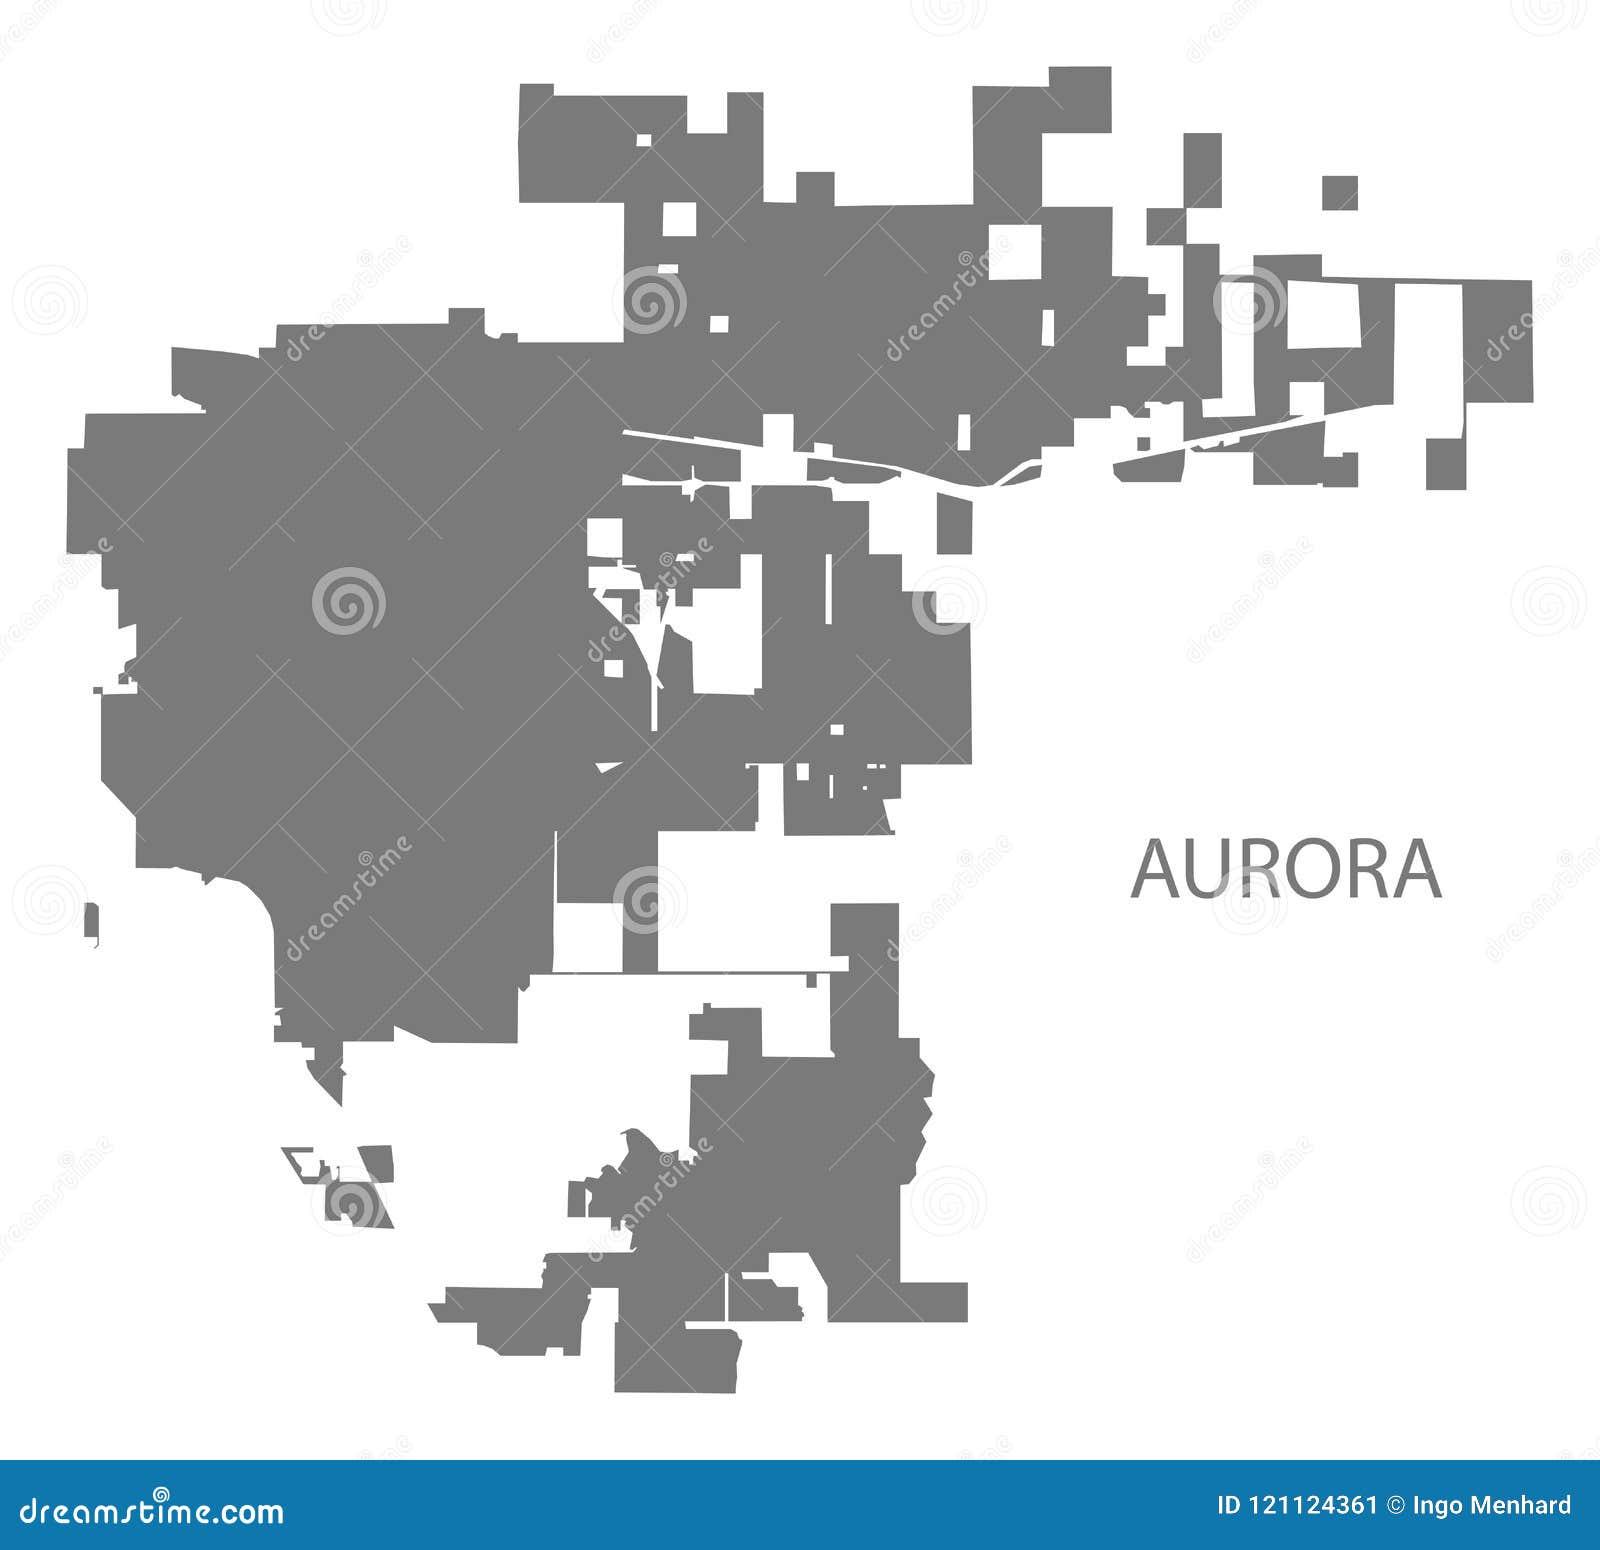 Aurora Colorado City Map Grey Illustration Silhouette Stock Vector ...